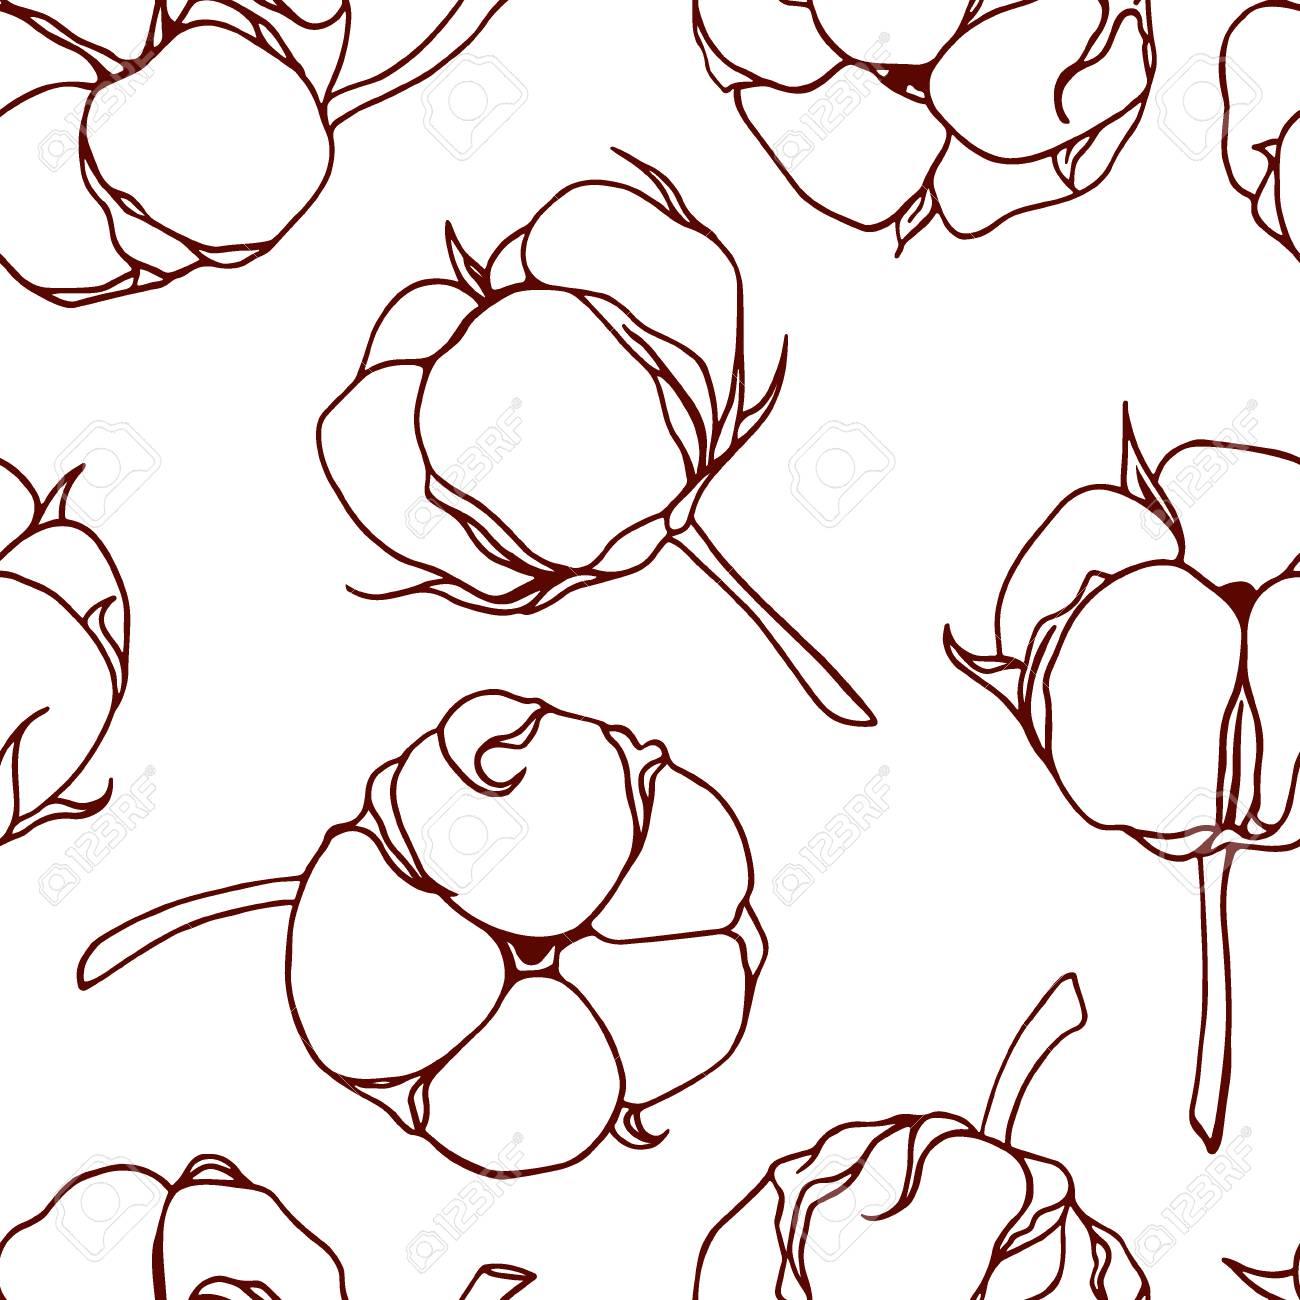 Branche Fleur De Coton vector seamless pattern with hand drawn cotton flowers. beautiful..